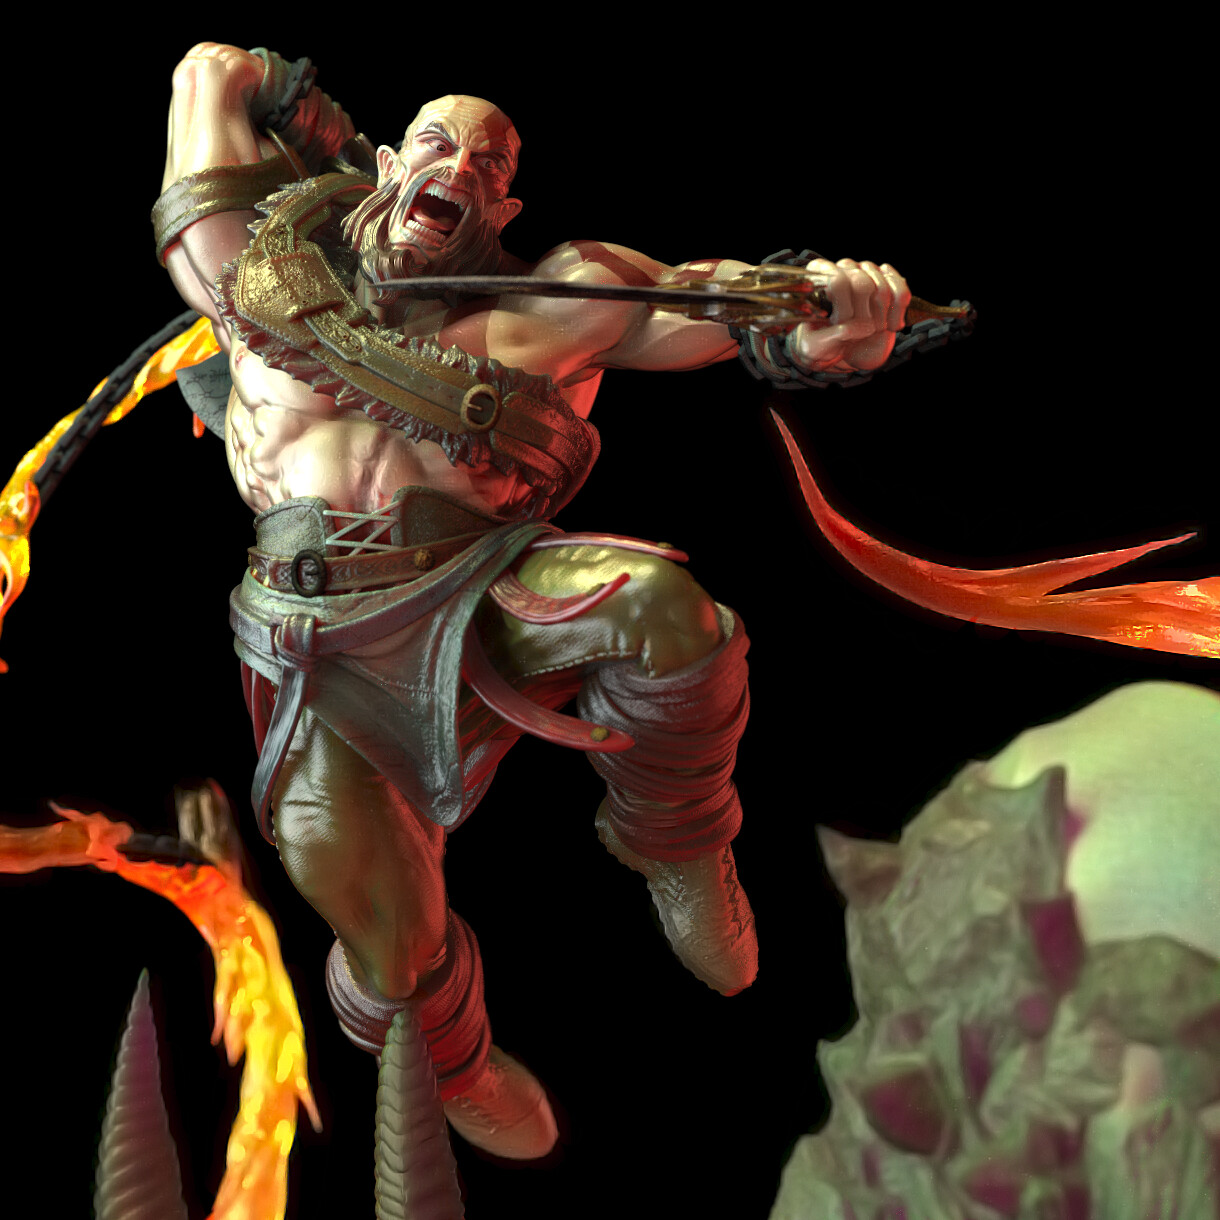 God of war 4 stylish statue